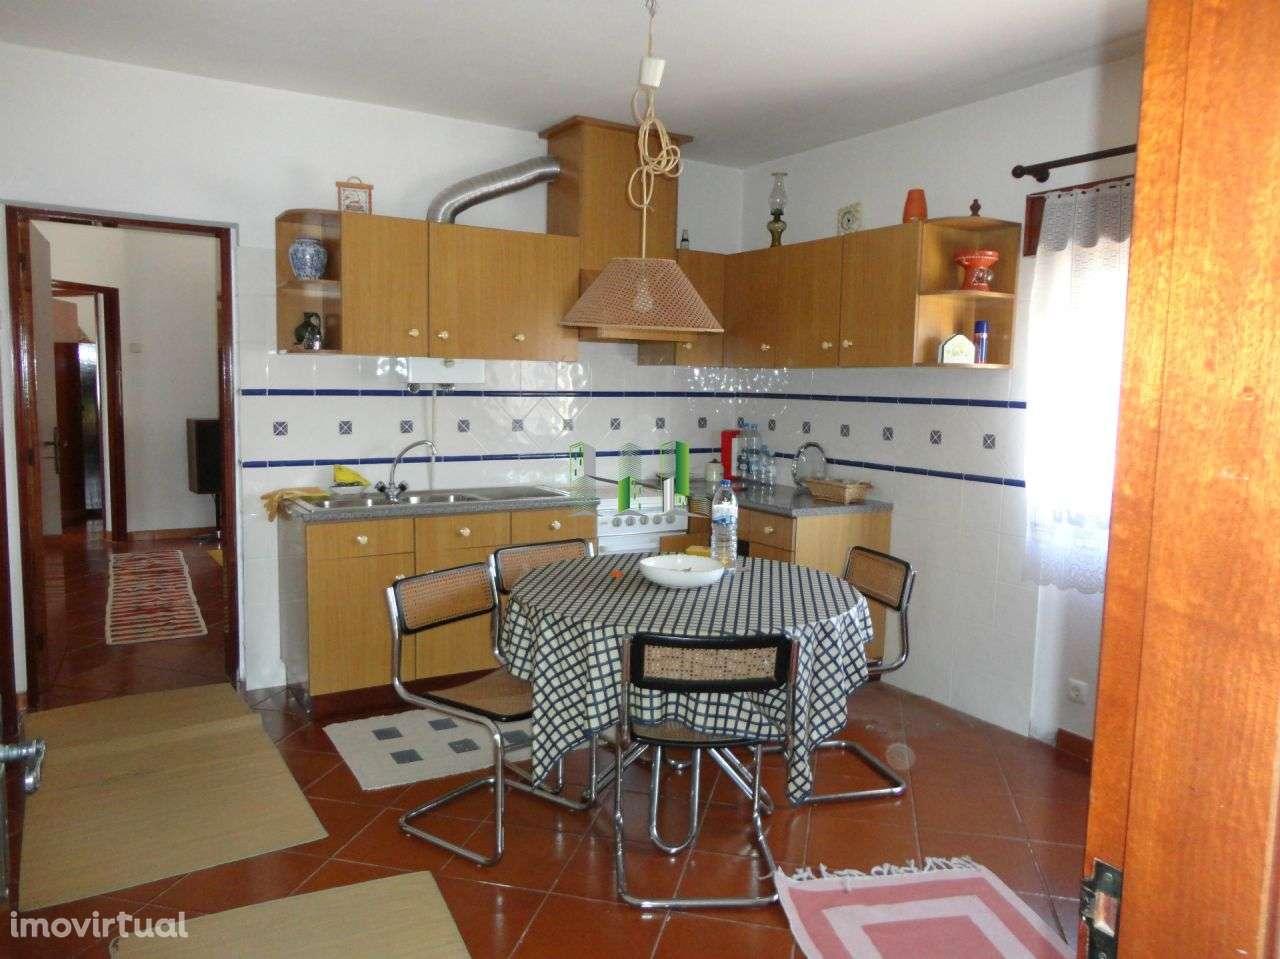 Moradia para comprar, Louriçal, Pombal, Leiria - Foto 3